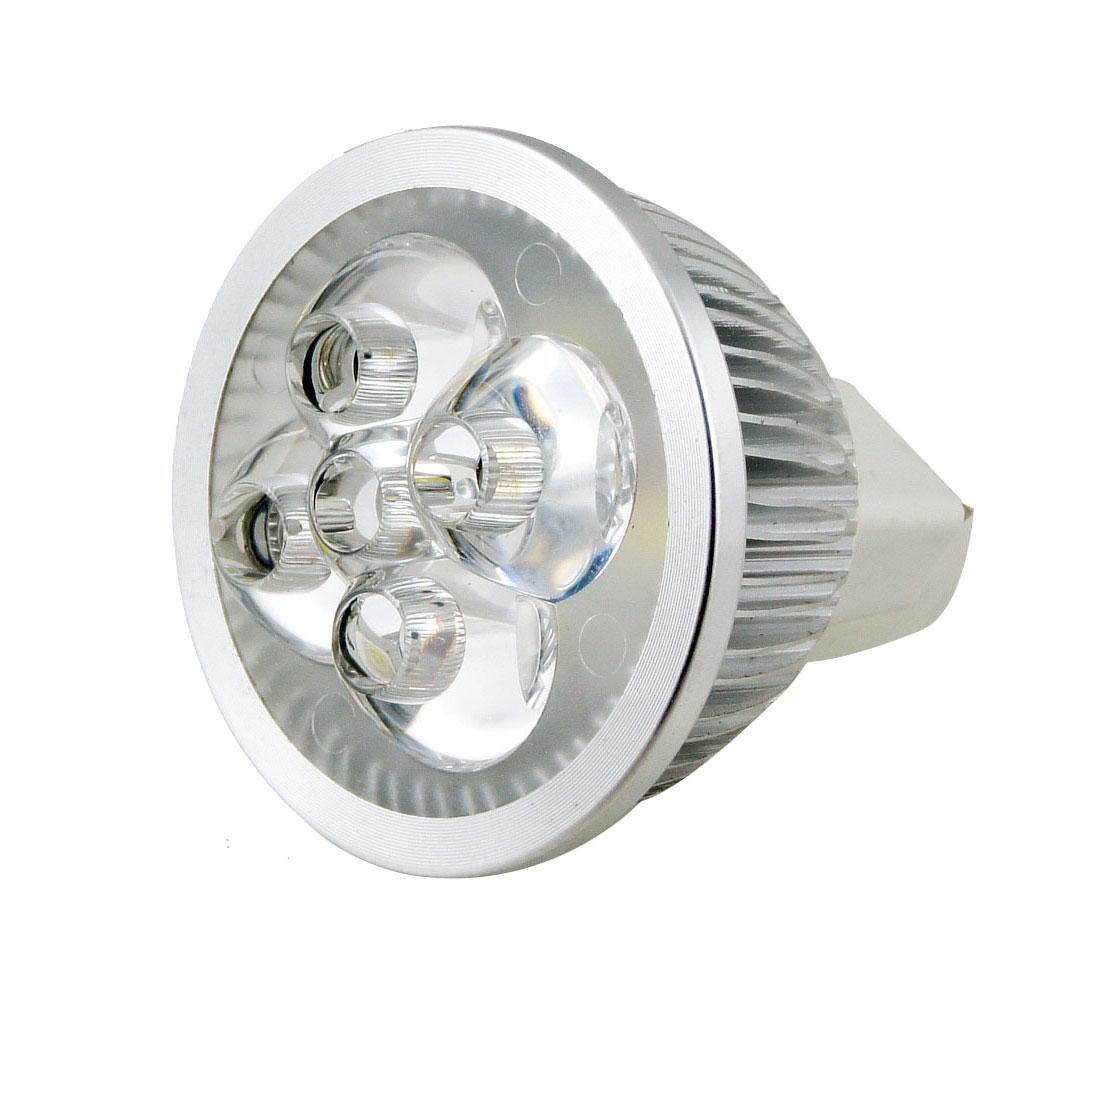 MR16 Base 4x1W LED Pure White Lamp Bulb Spotlight Downlight 6000K 12V